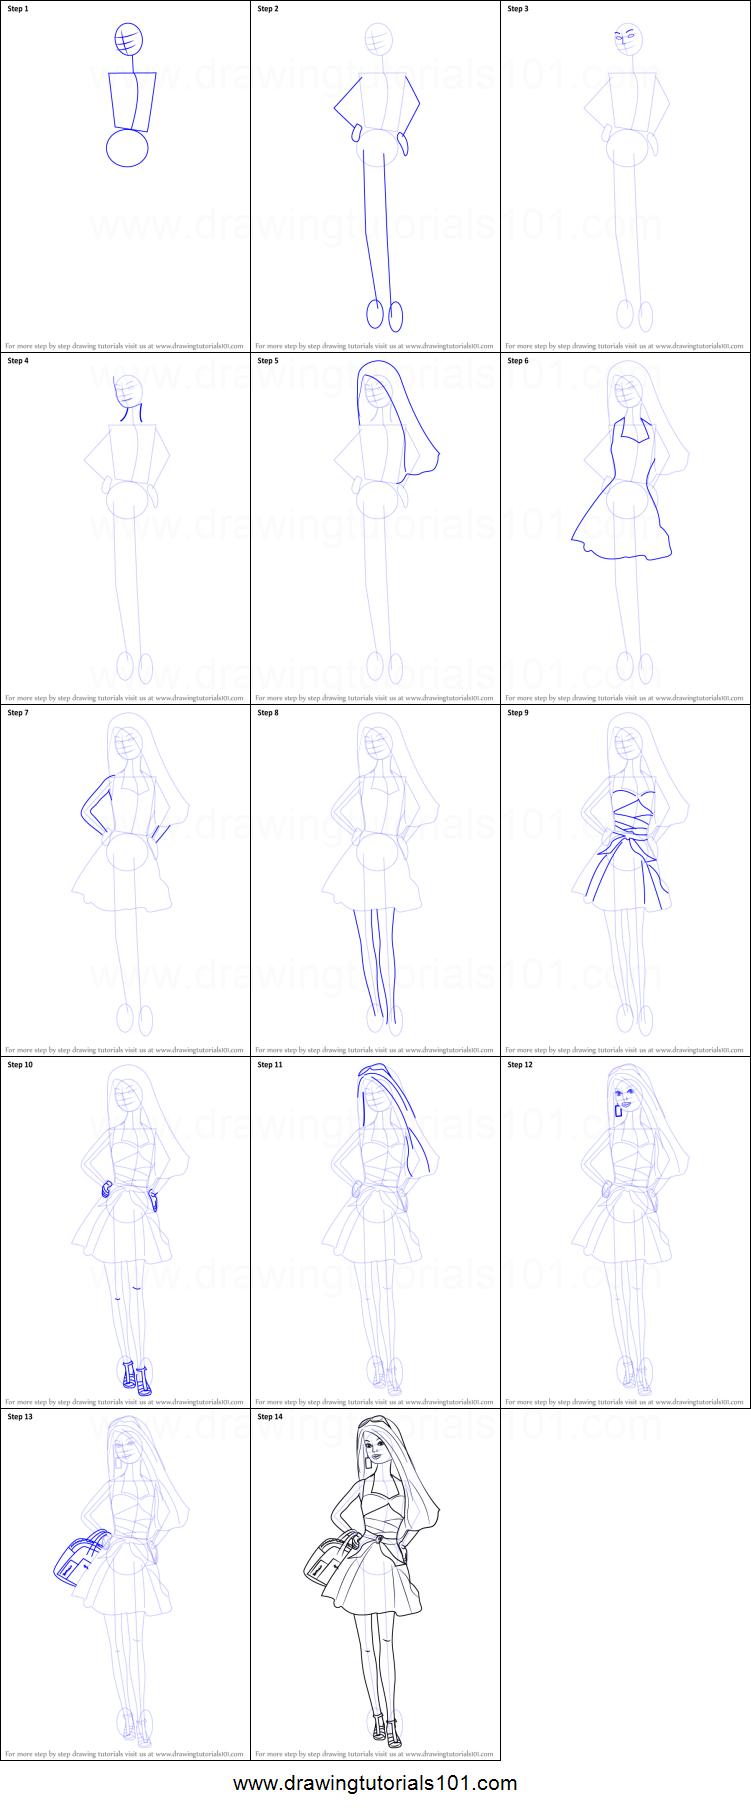 Drawn barbie step by step How printable  sheet Barbie